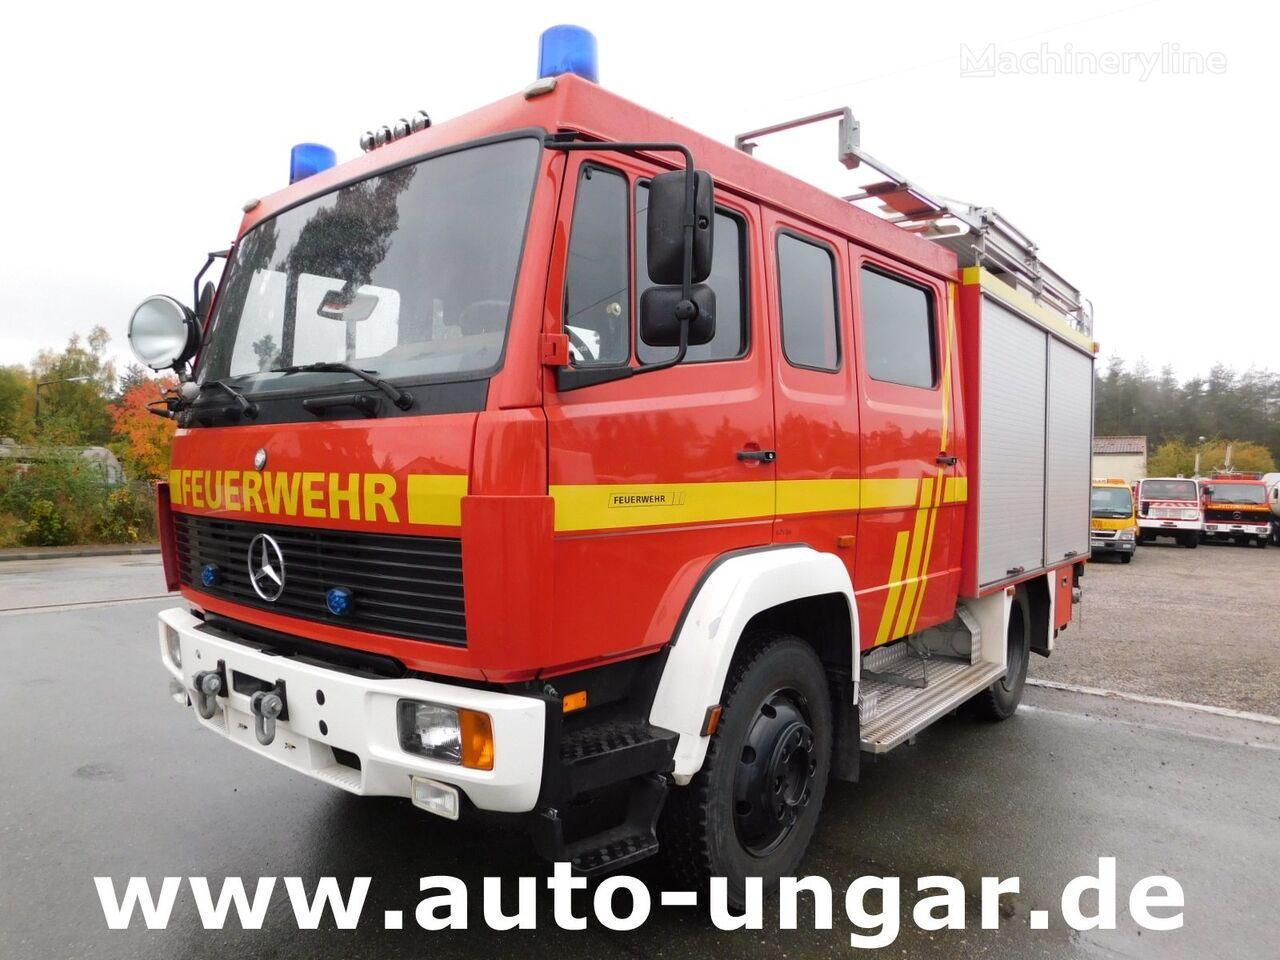 MERCEDES-BENZ 917AK LF8/6 4x4 allrad fire truck